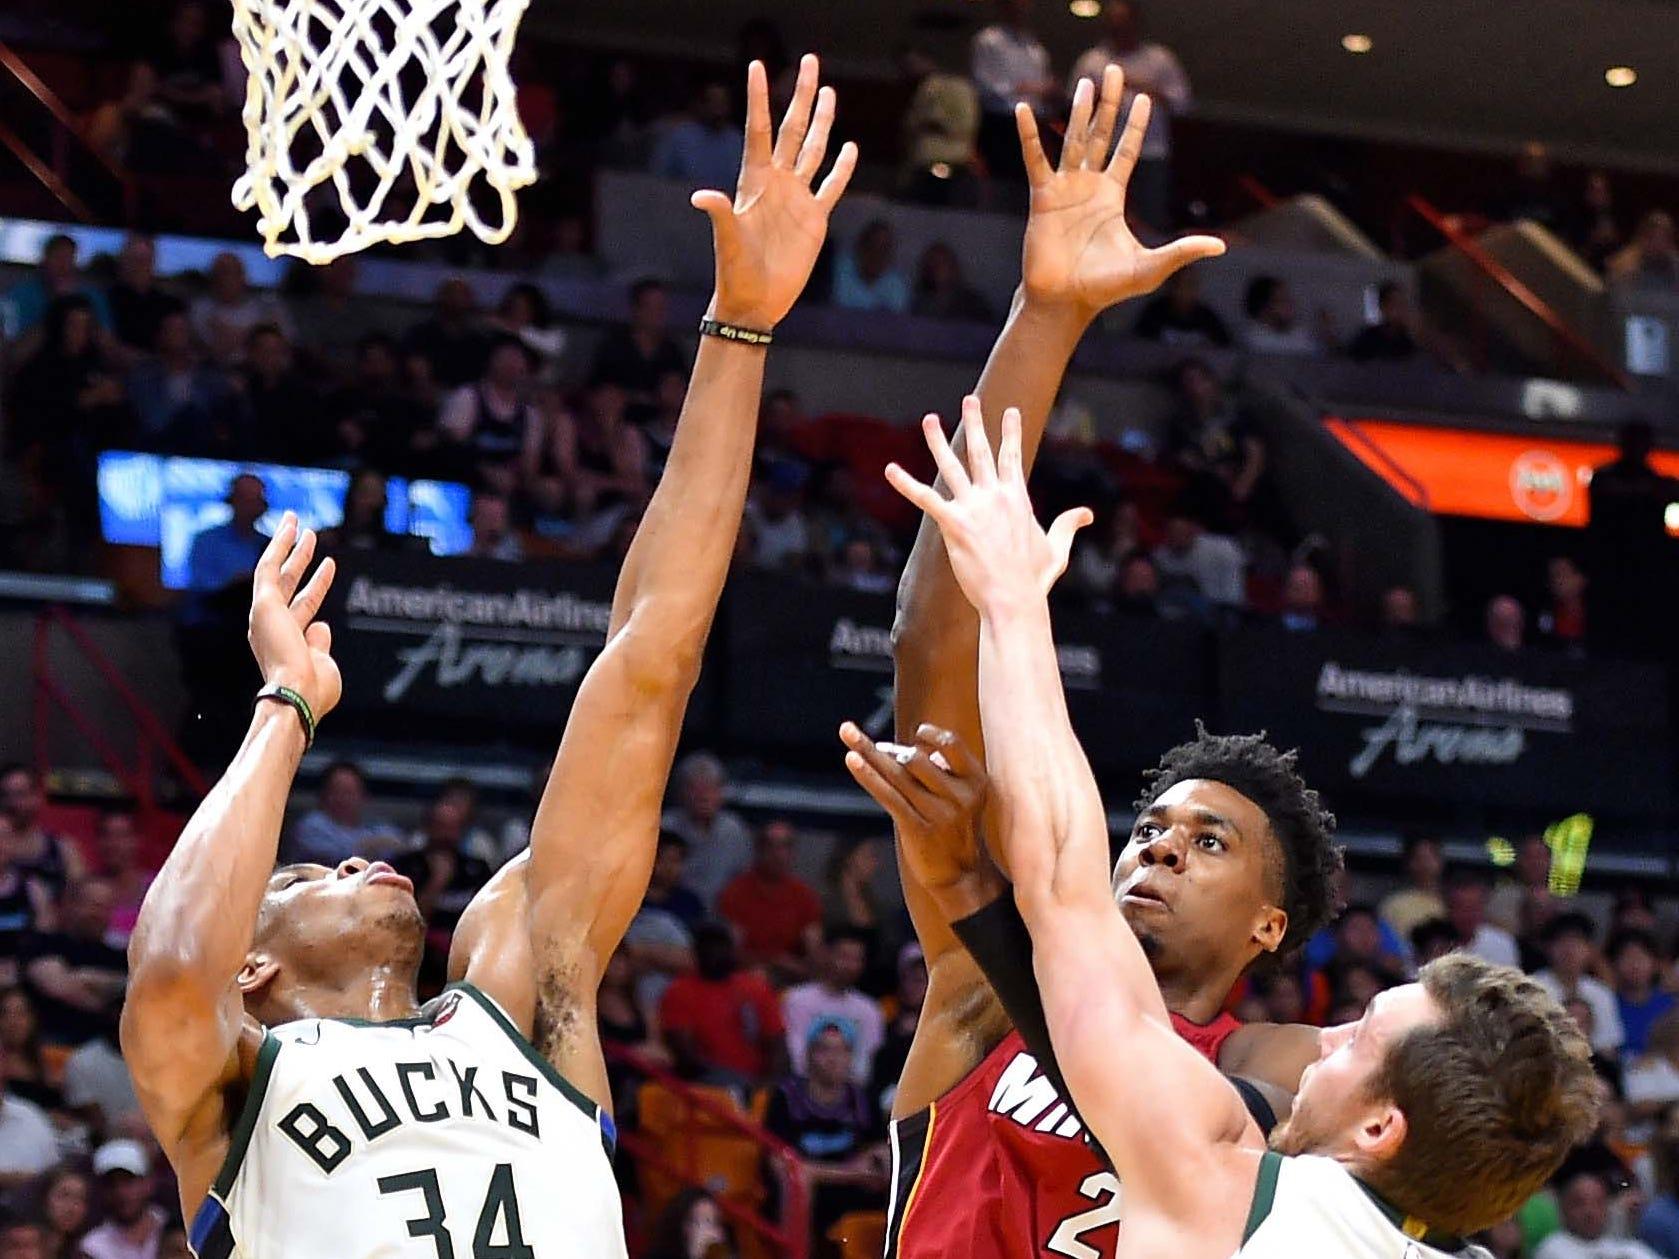 Heat center Hassan Whiteside (21) shoots between Bucks forward Giannis Antetokounmpo and Bucks guard Pat Connaughton.